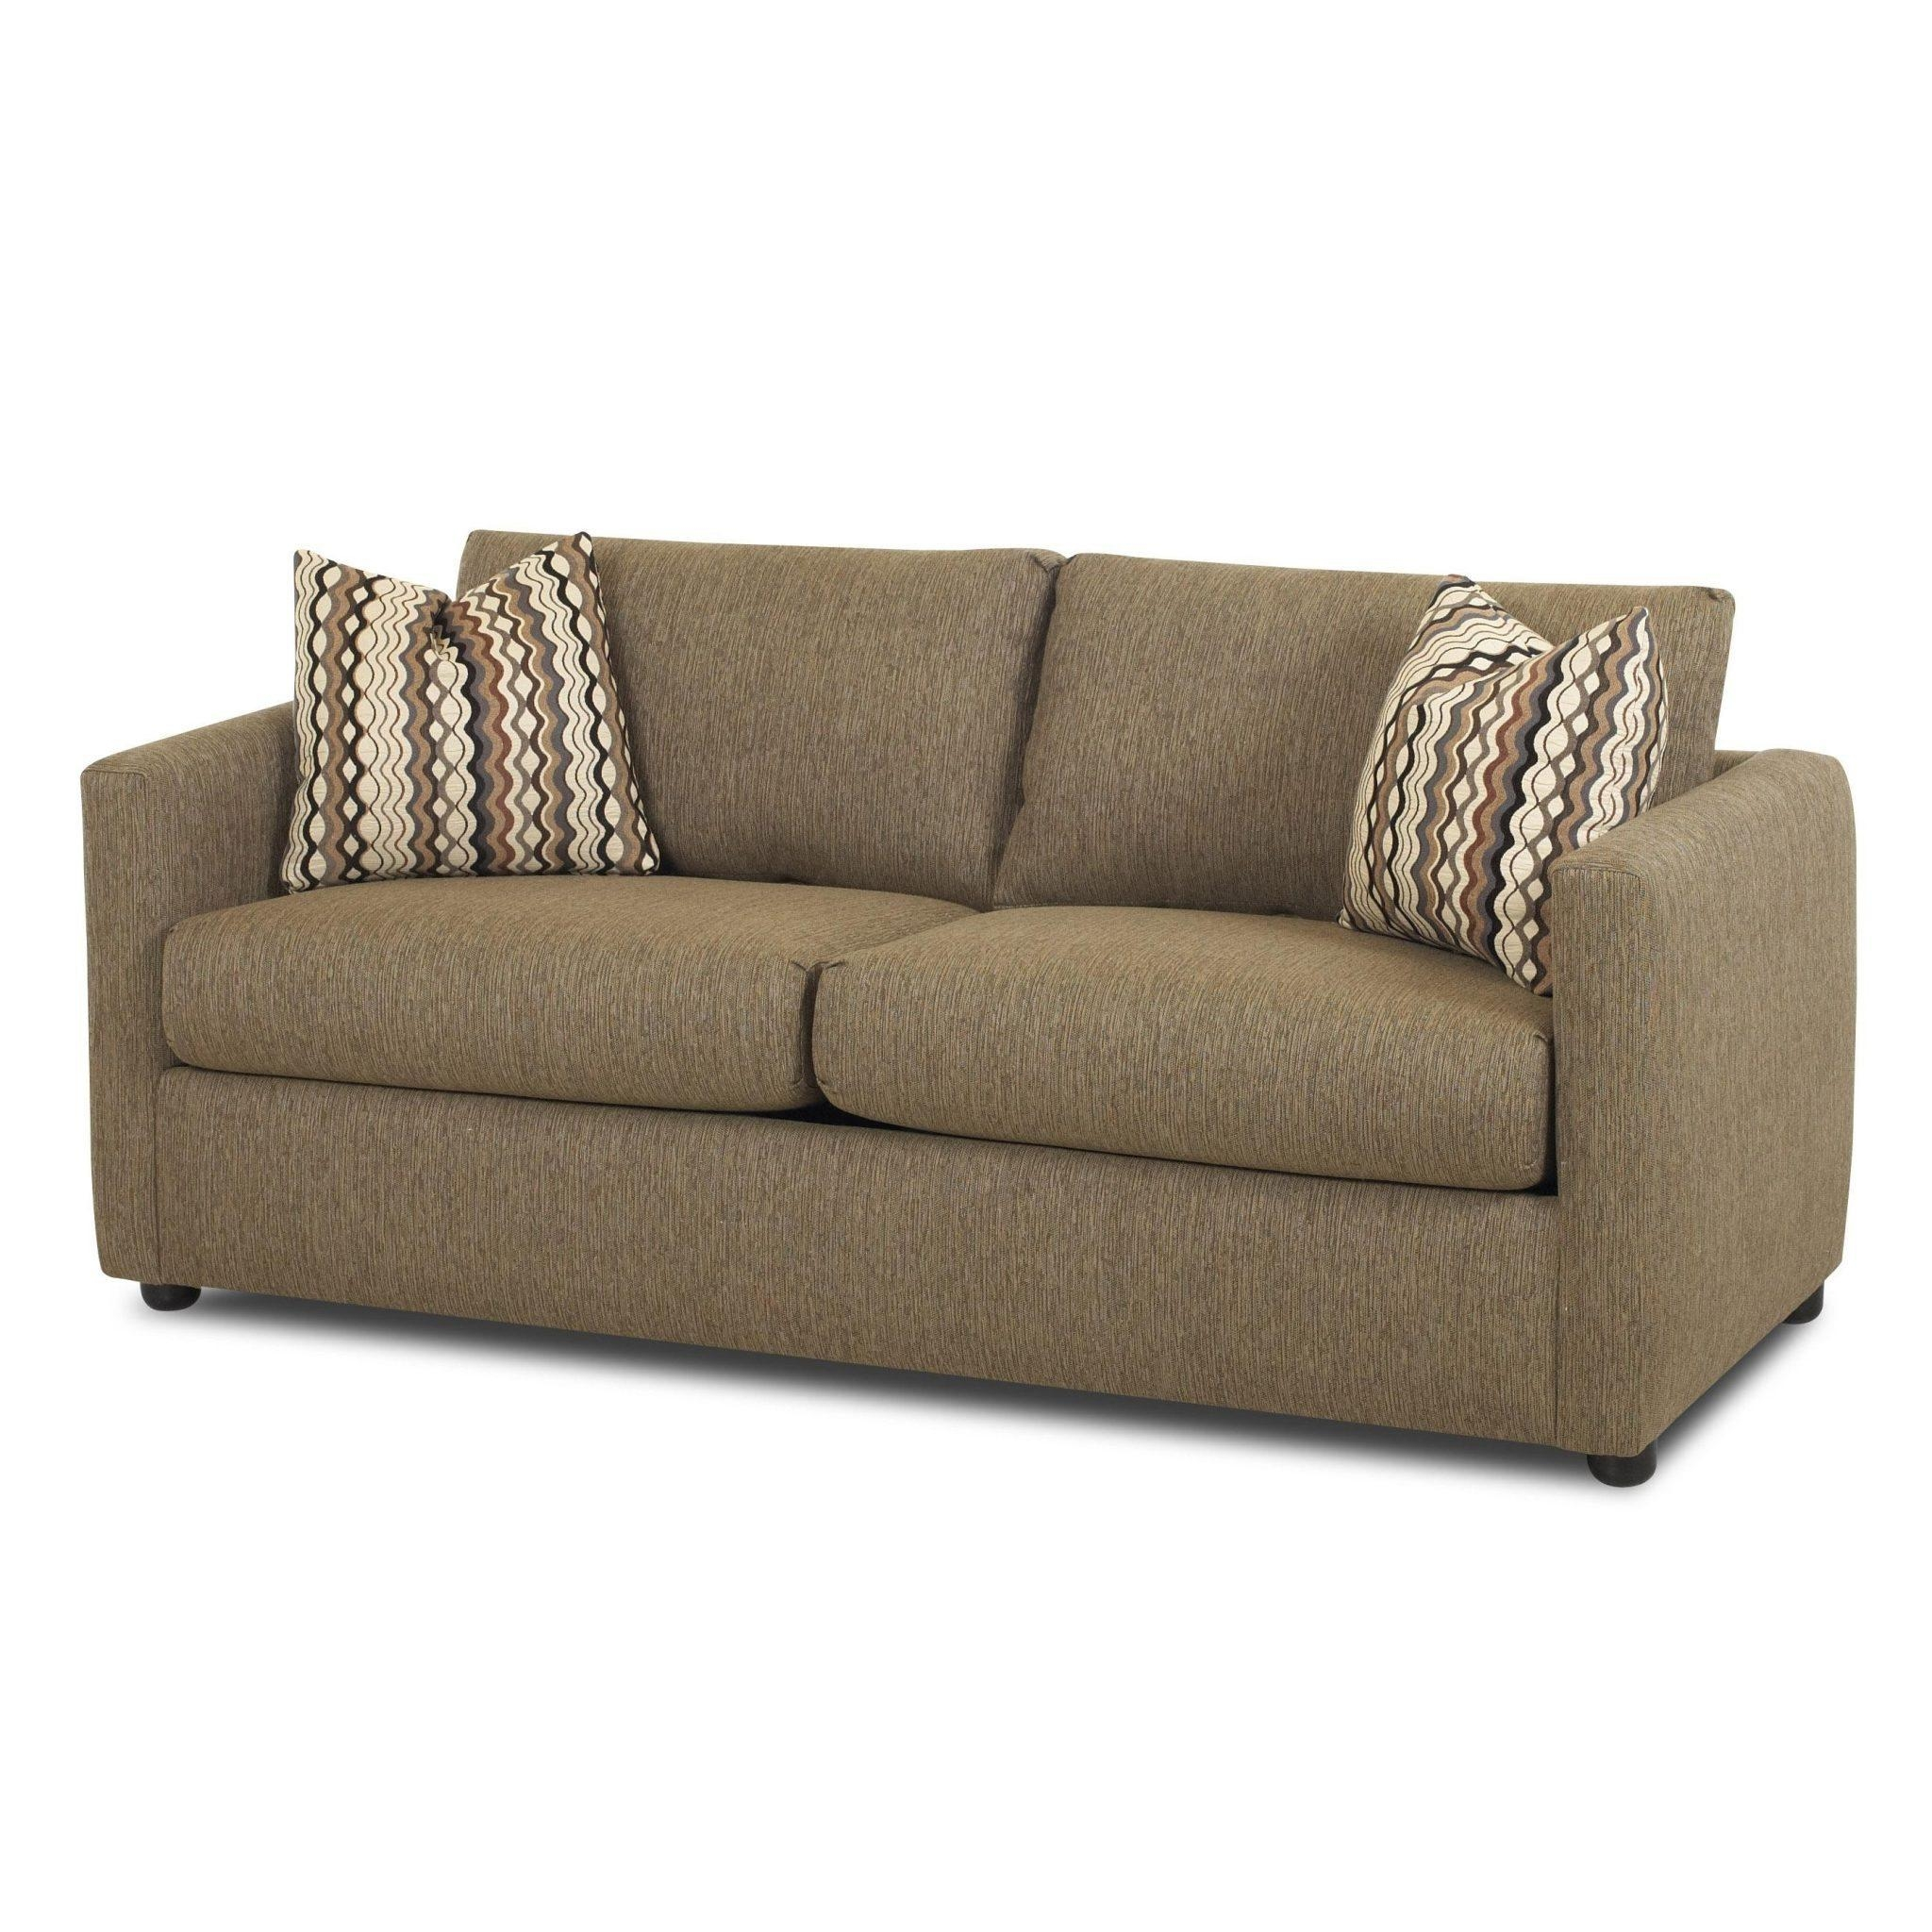 Sleeper Sofa Austin With Design Photo 23427 | Kengire Regarding Austin Sleeper Sofas (Image 5 of 20)